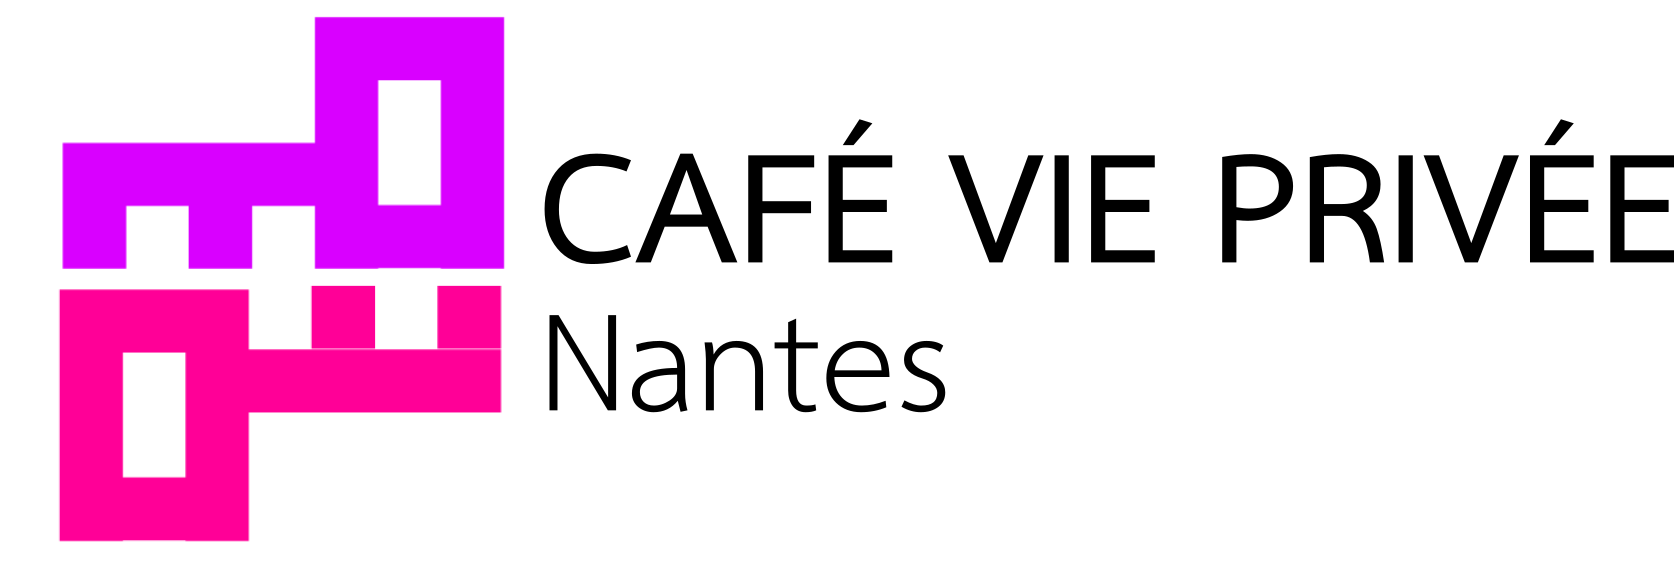 cafevieprivee/logo1.png